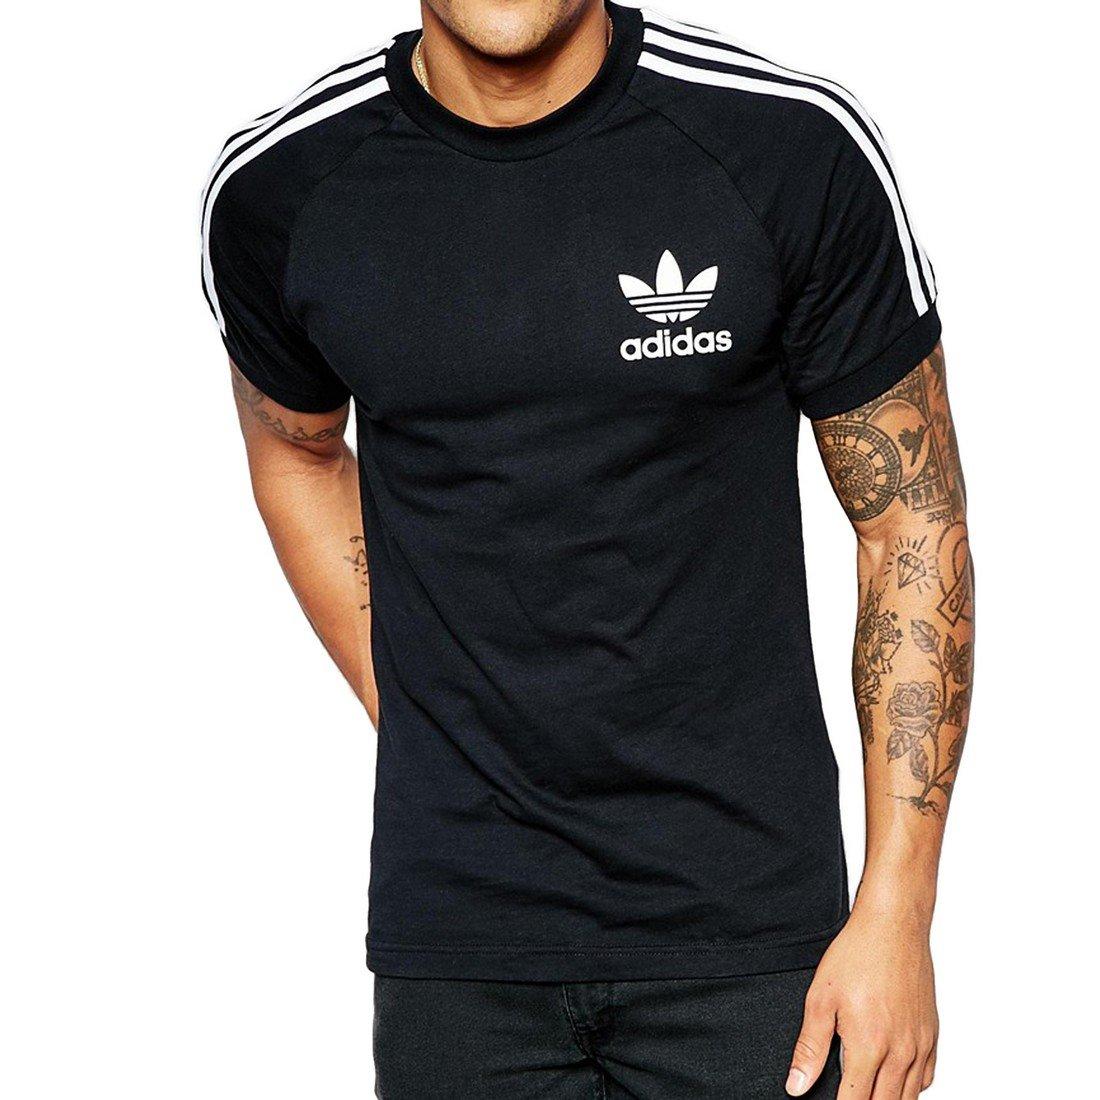 31d43193 adidas Men's T-Shirt California: Amazon.co.uk: Sports & Outdoors